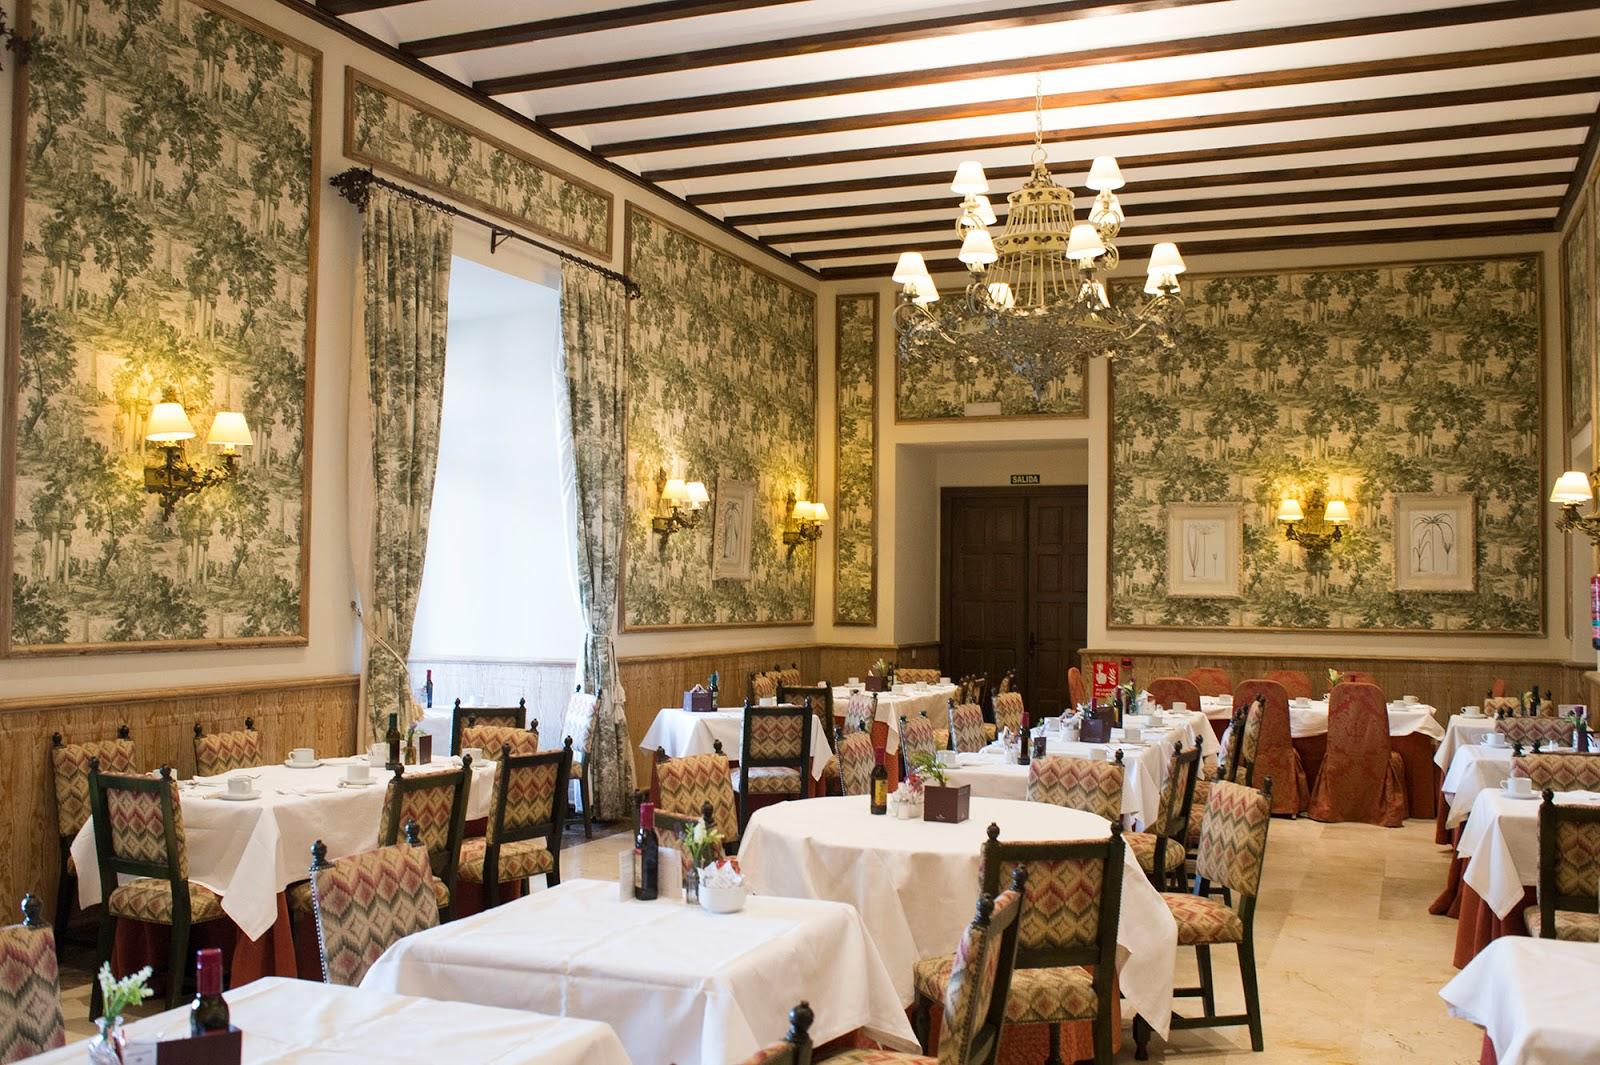 lerma burgos spain castile leon parador hotel ducal palace beautiful village restaurant